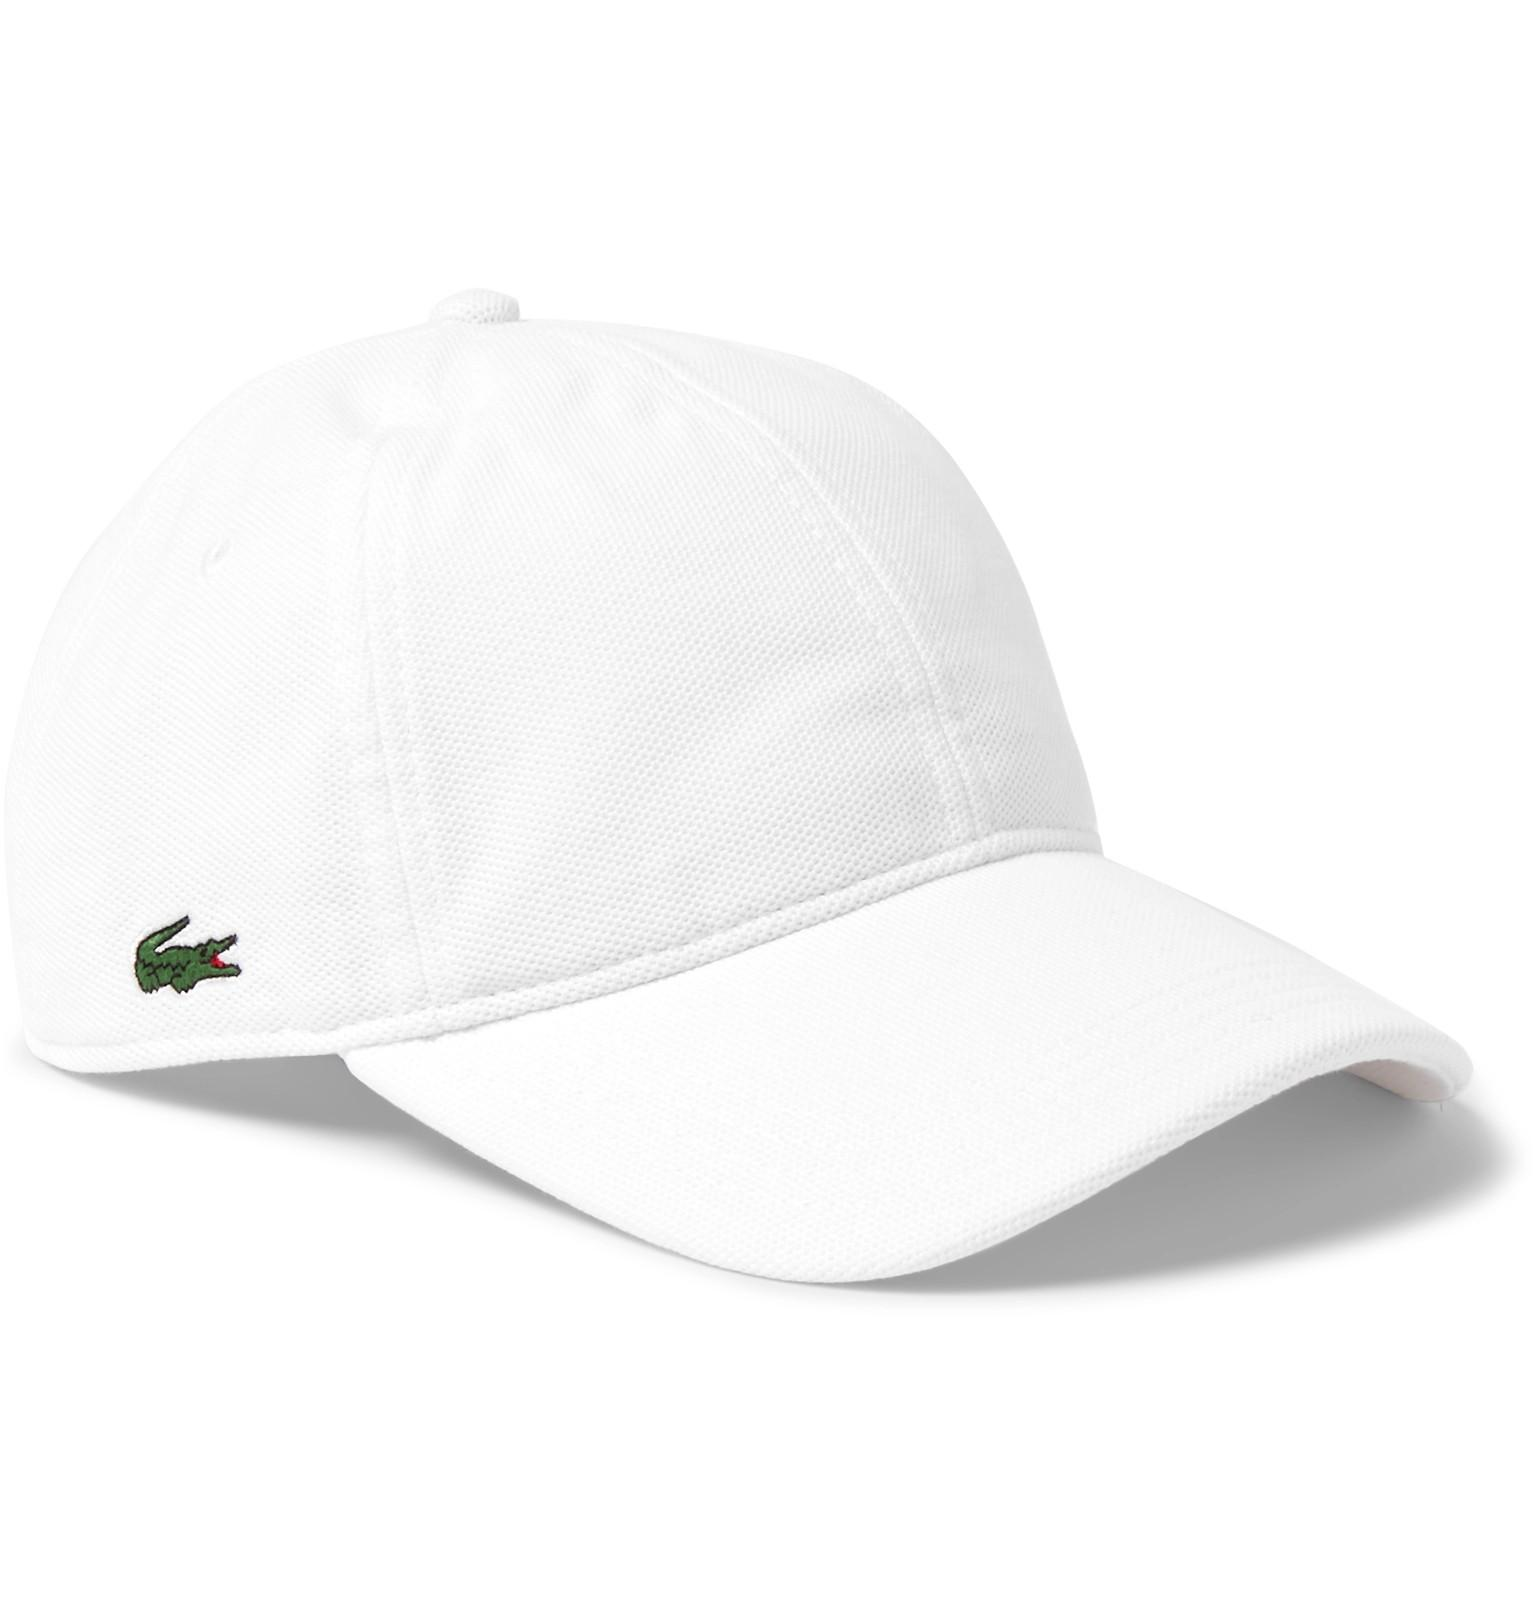 7e29f88738c32 Lacoste Sport Logo-appliquéd Woven Tennis Cap in White for Men - Lyst